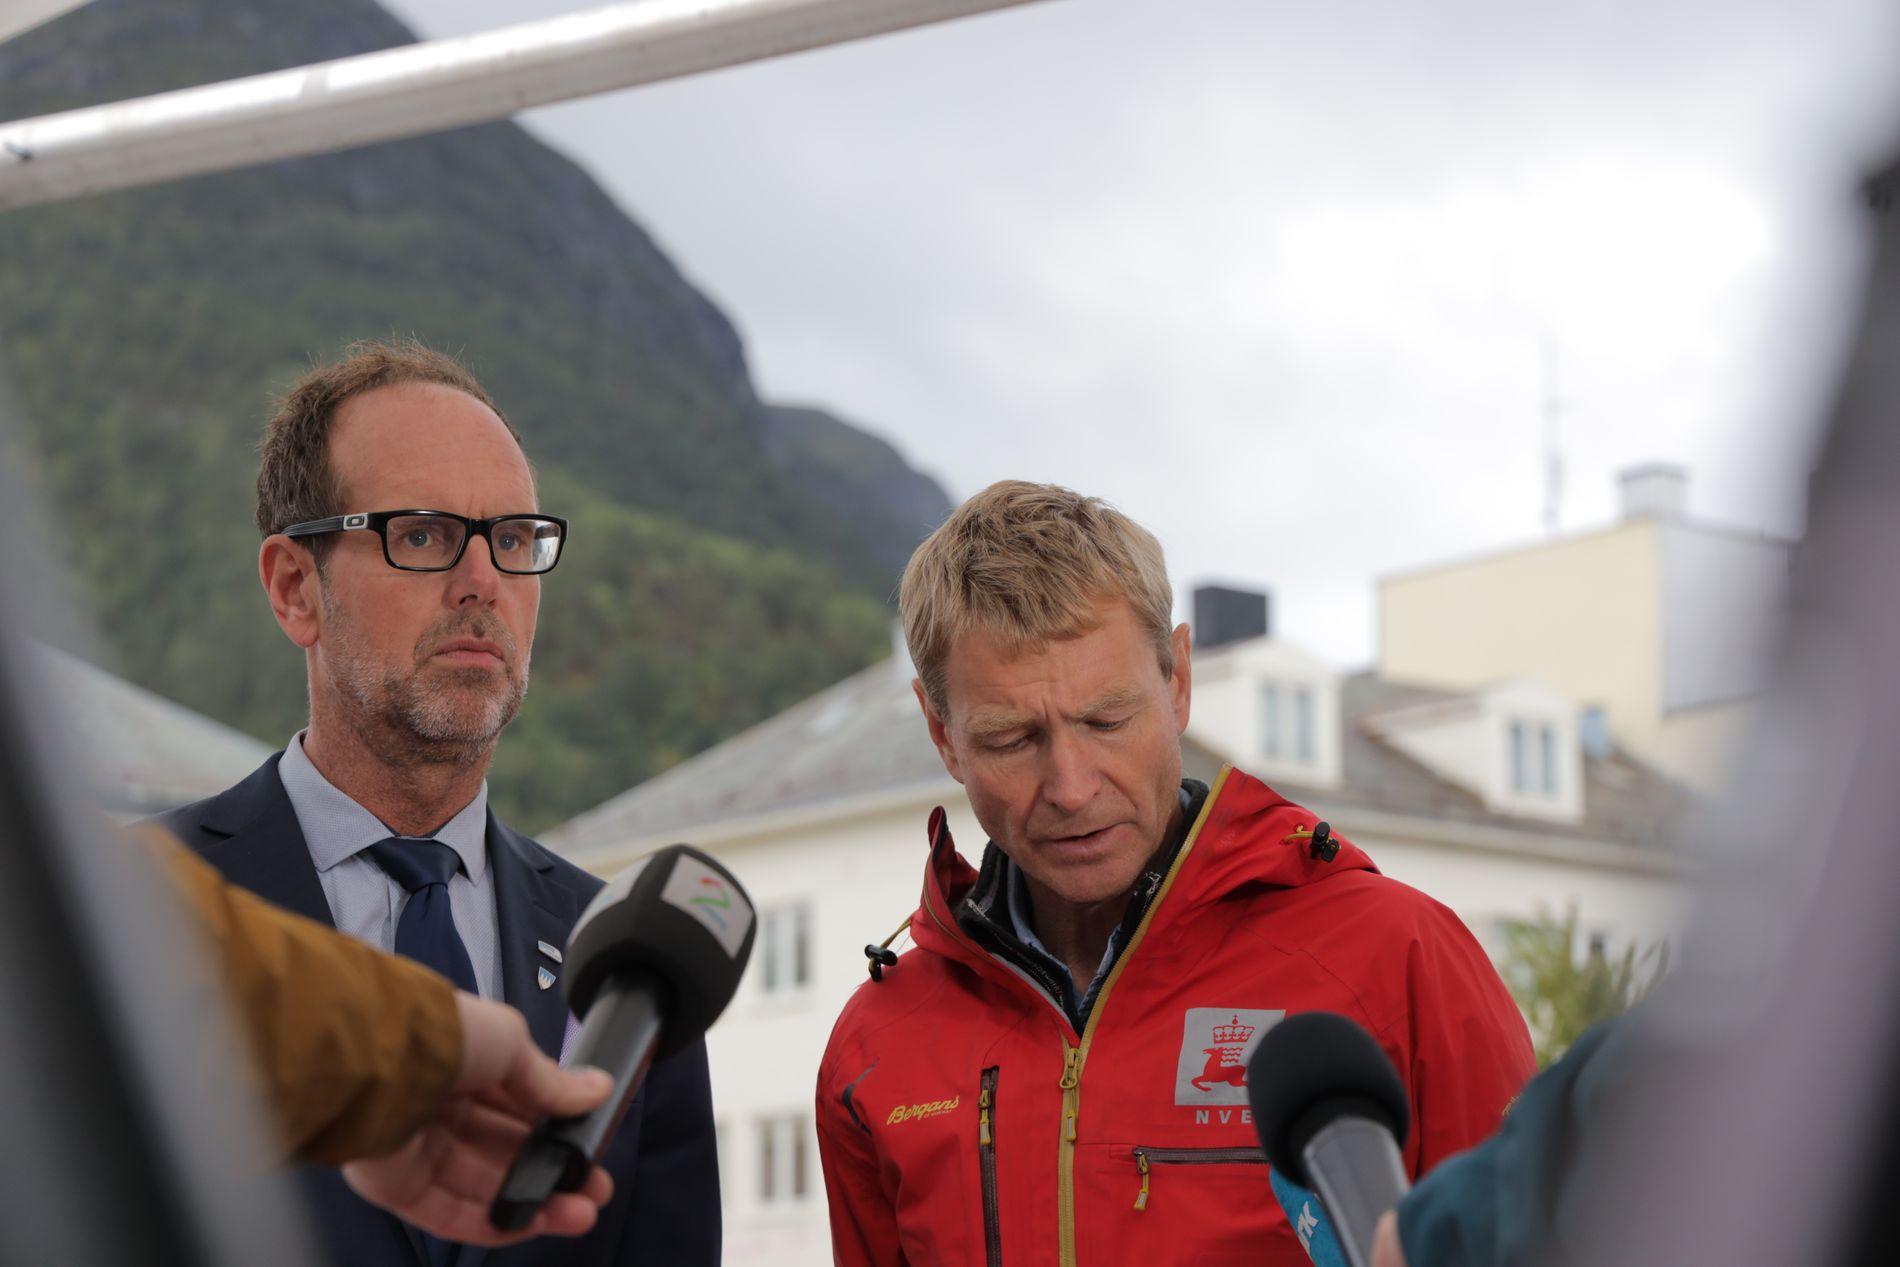 Rauma-ordfører Lars Olav Hustad (H) og geolog Lars Harald Blikra i NVE møtte pressen i Åndalsnes torsdag ettermiddag.   Foto: Ørn E. Borgen / NTB scanpix